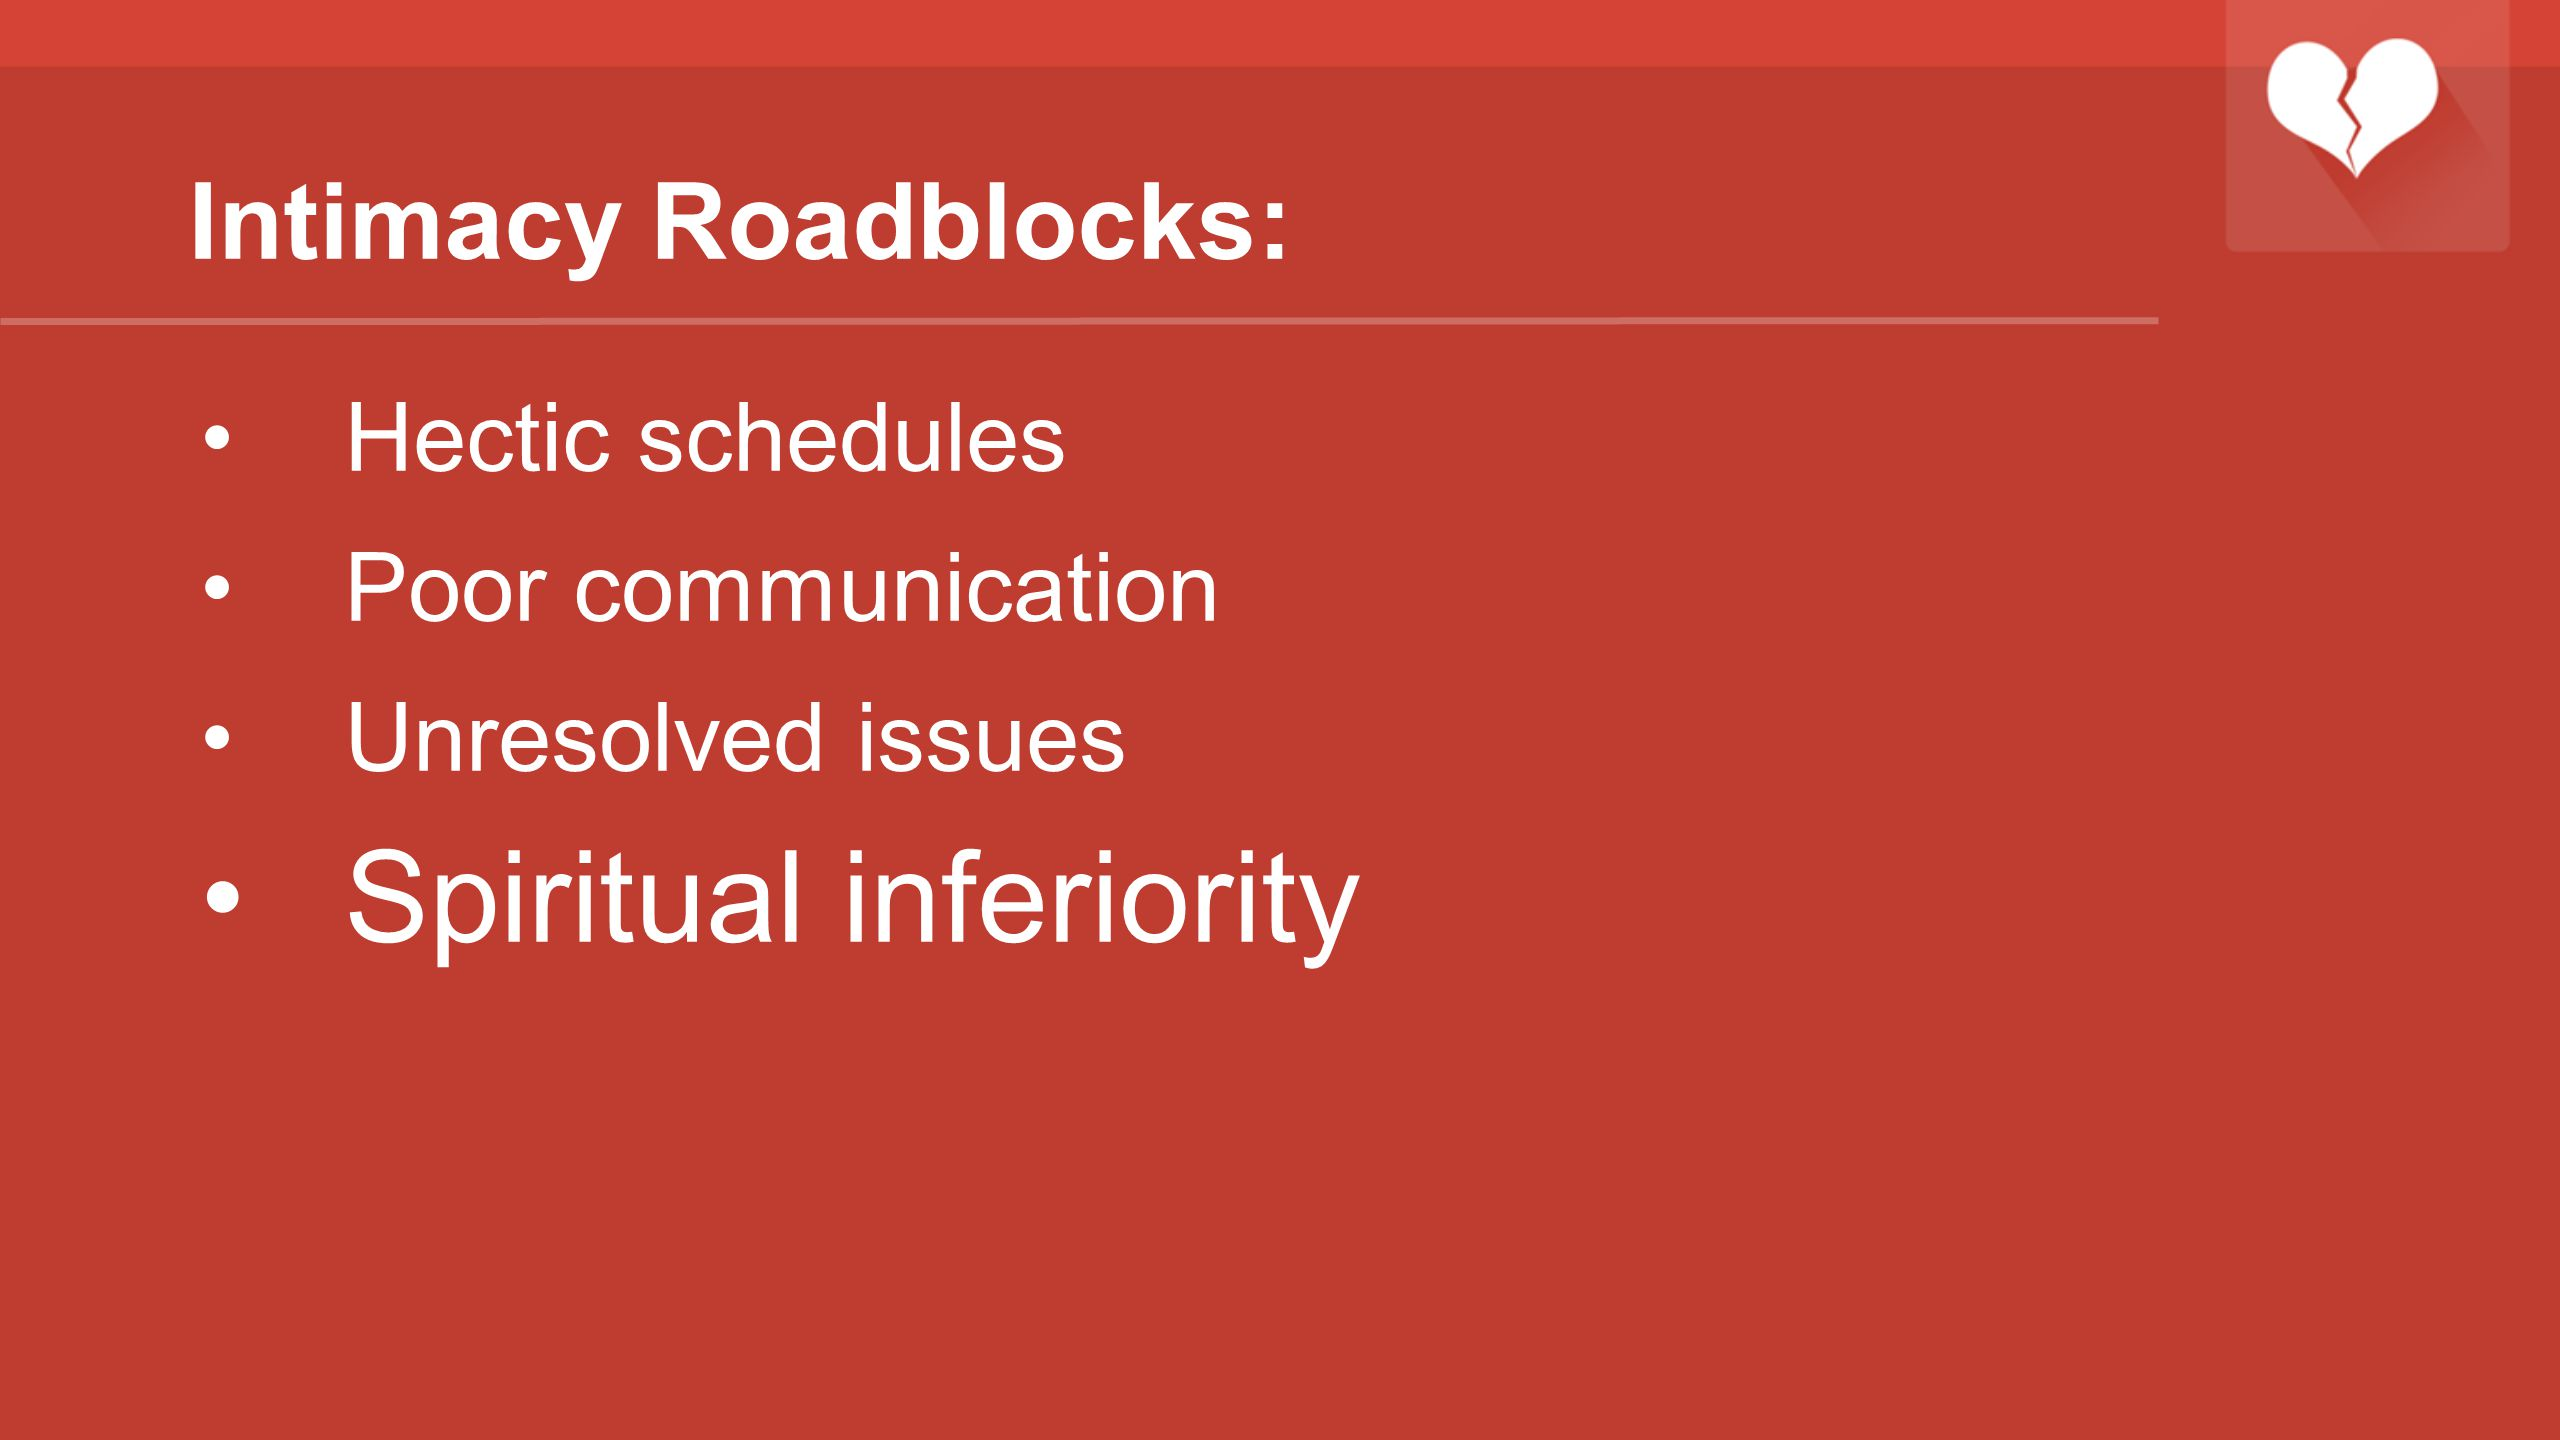 Intimacy Roadblocks: Hectic schedules Poor communication Unresolved issues Spiritual inferiority